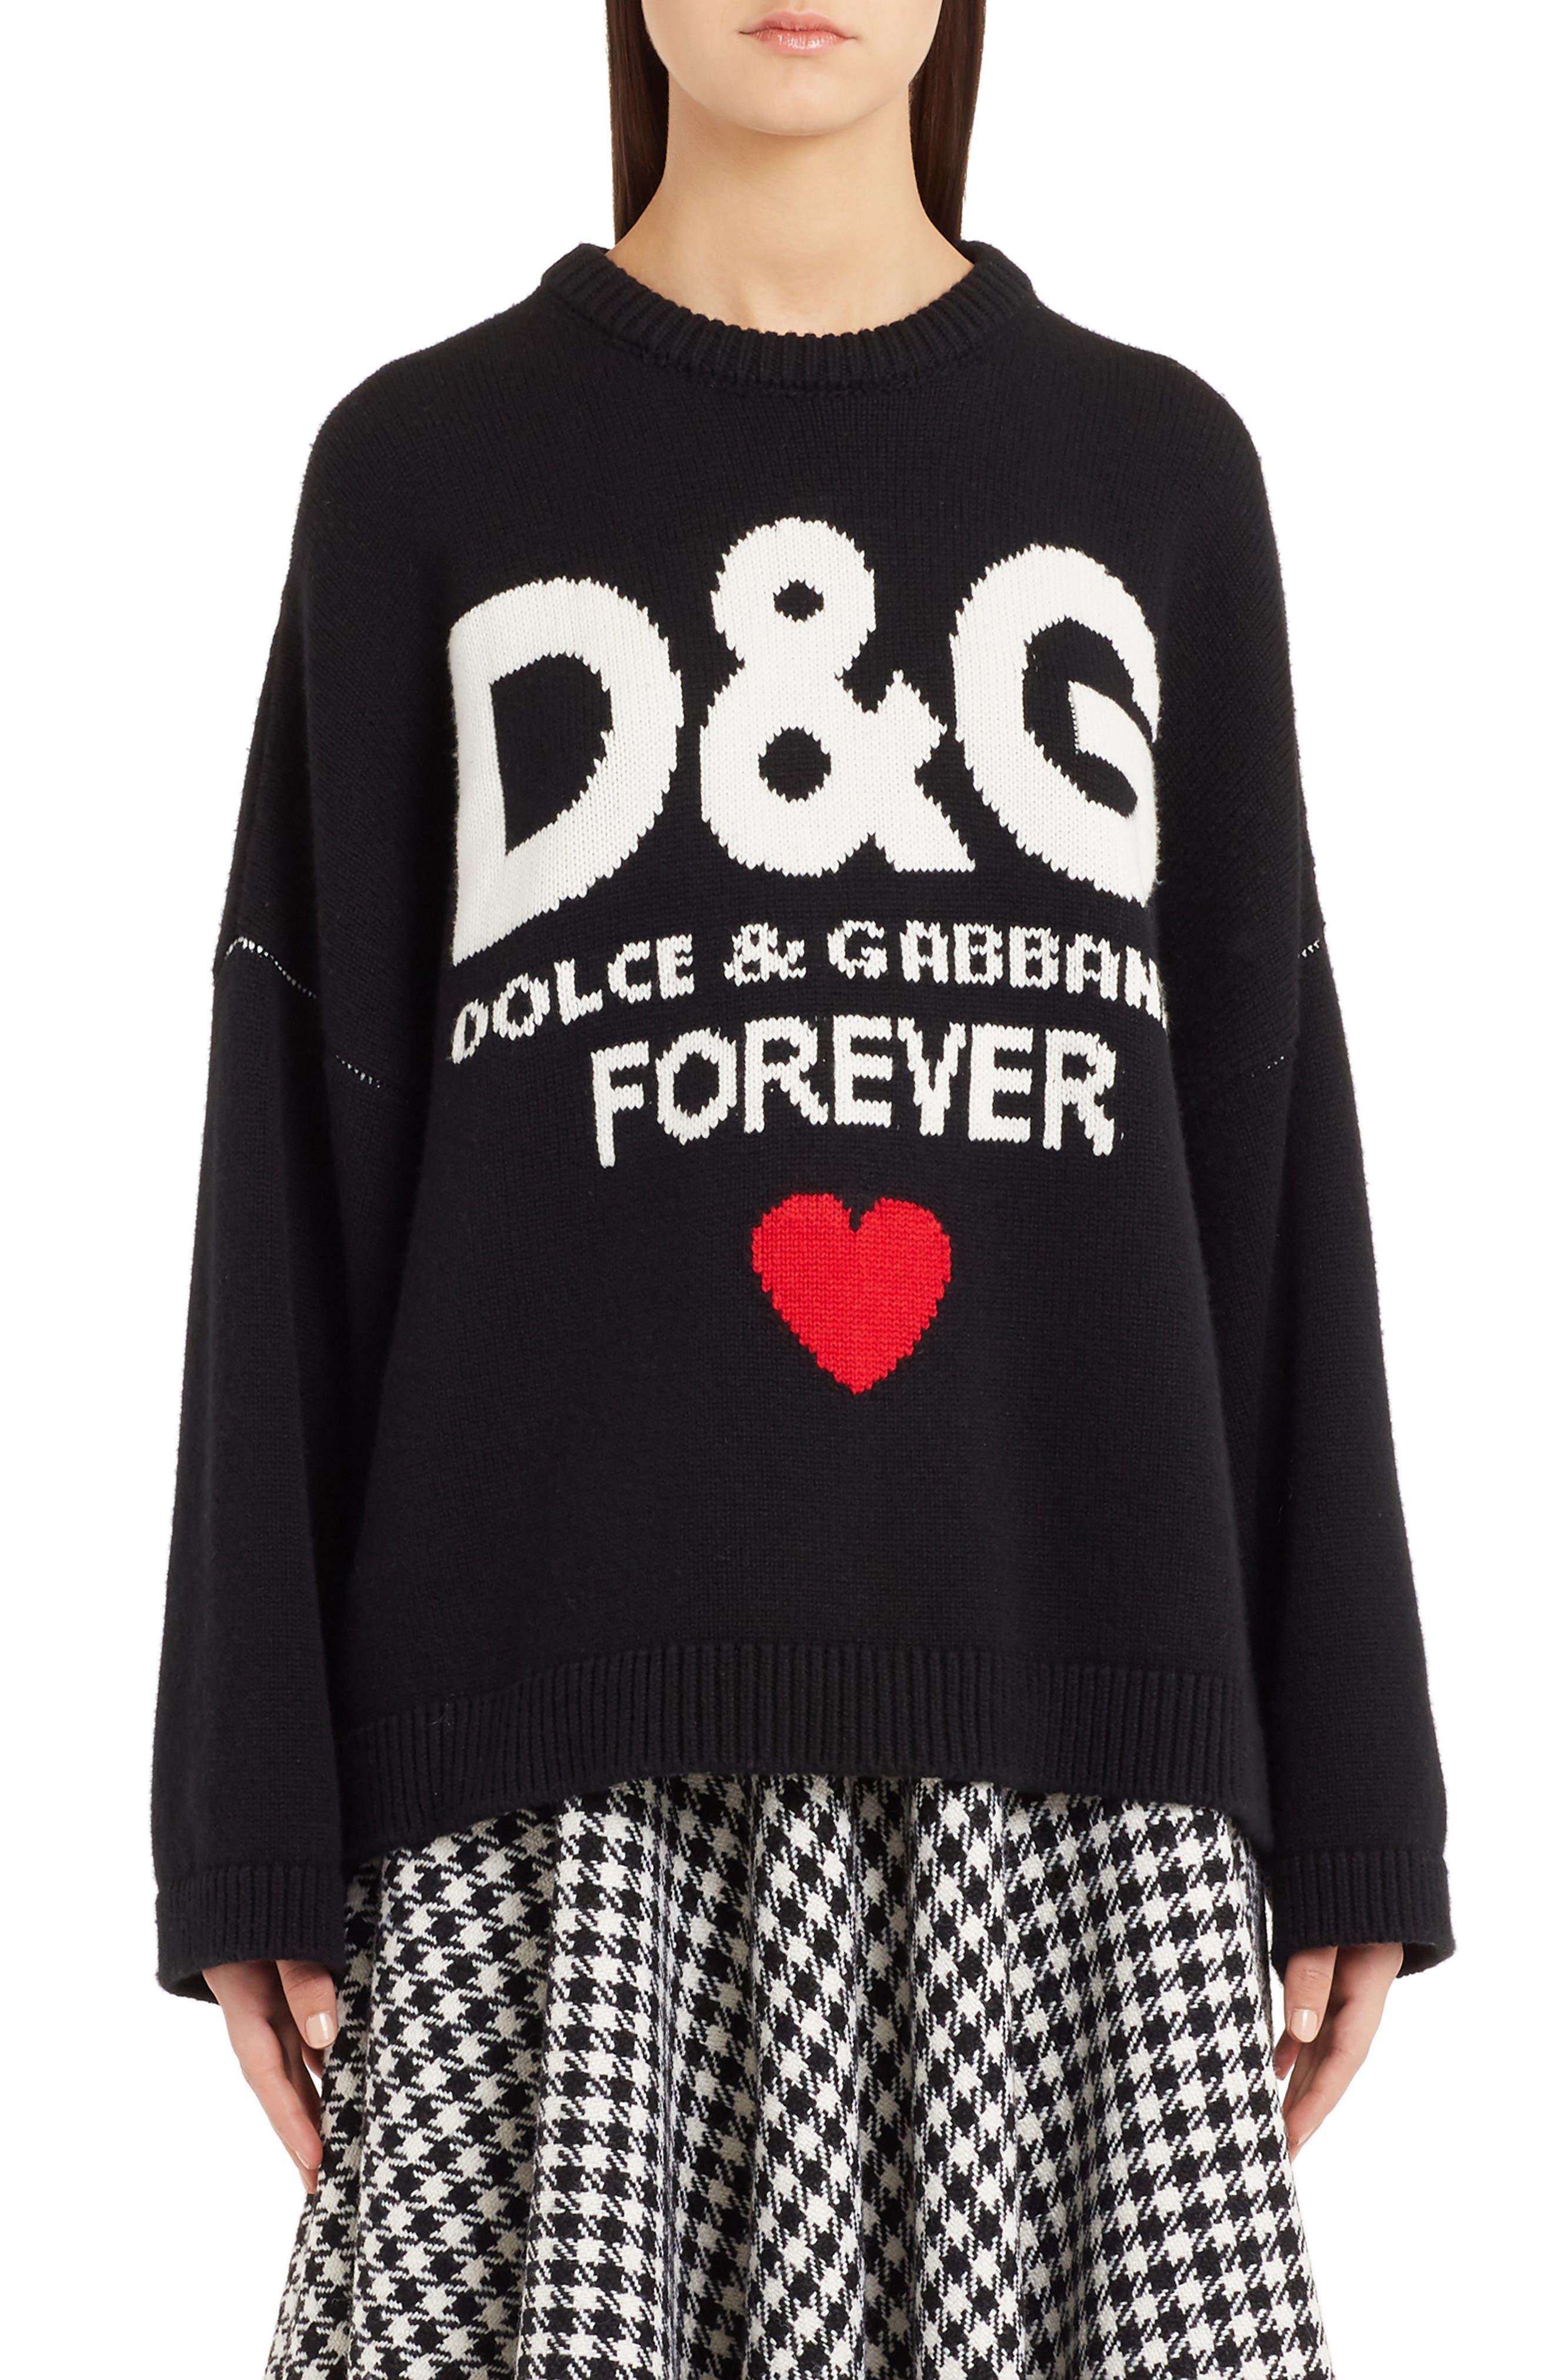 DOLCE&GABBANA Intarsia Logo Cashmere Sweater, Main, color, BLACK